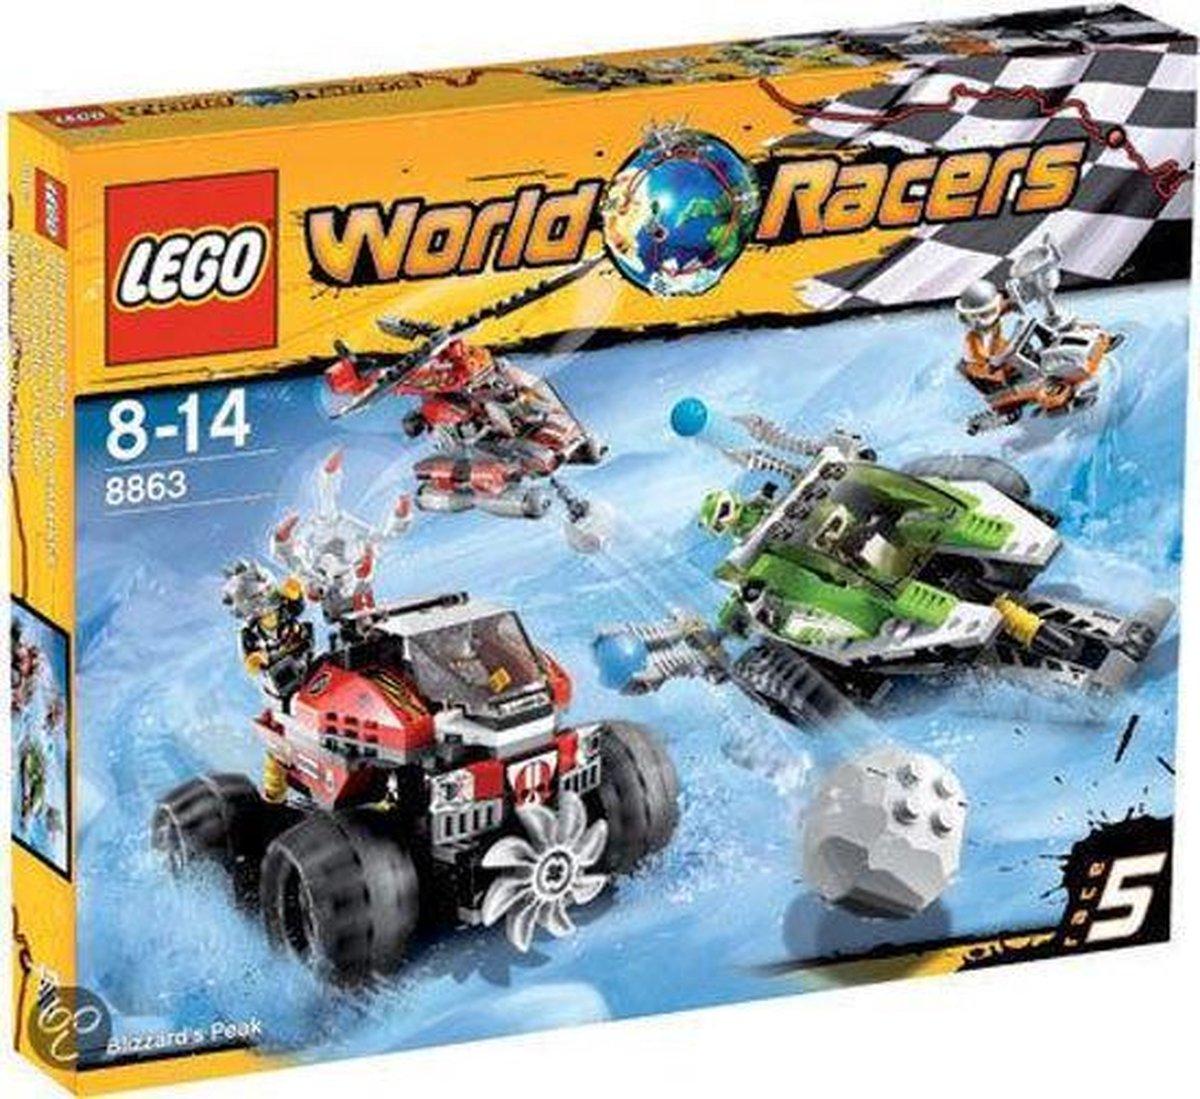 LEGO World Racers Sneeuwstorm Spits - 8863